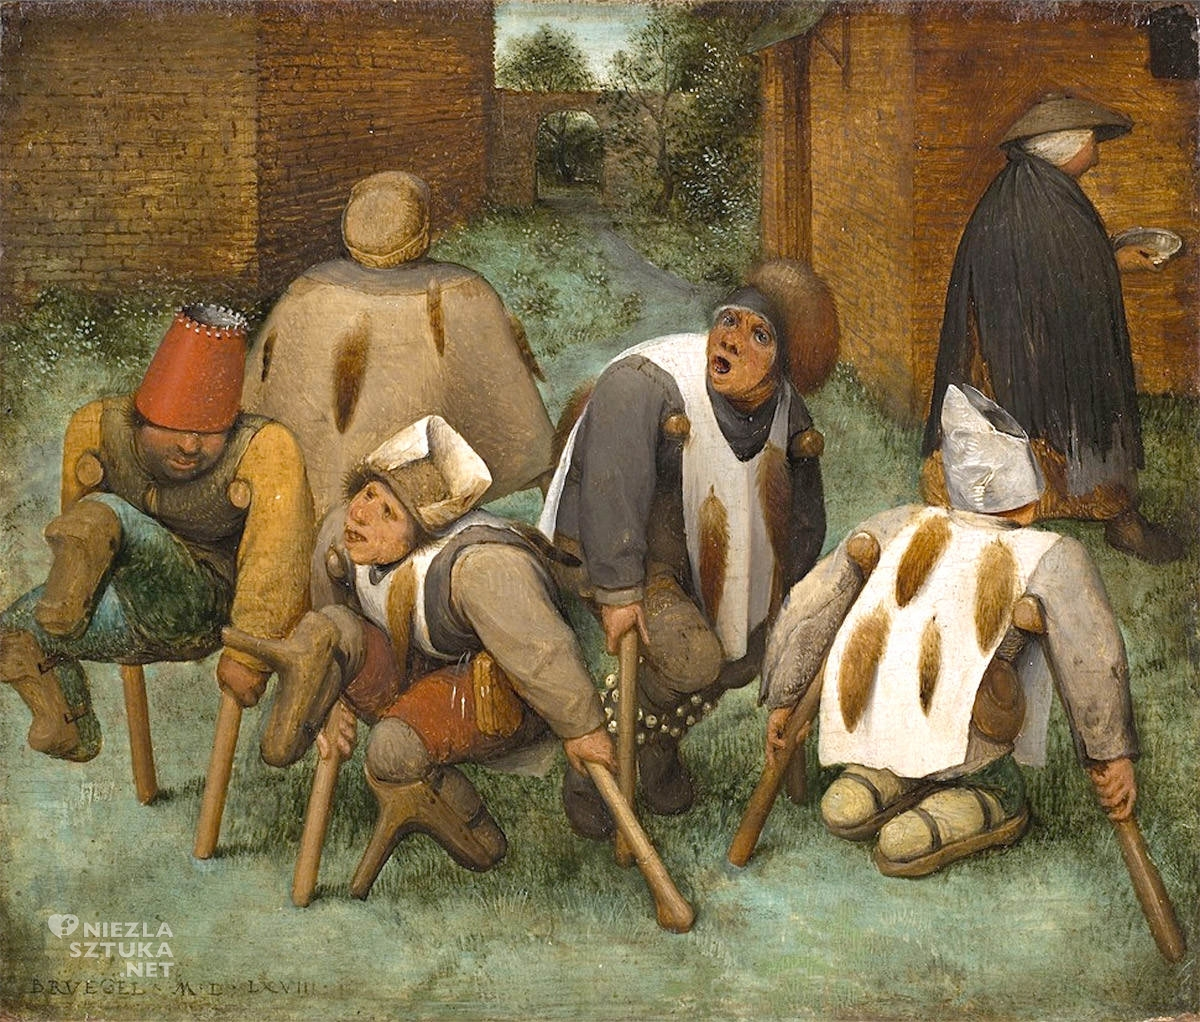 Pieter Bruegel, Kalecy, sztuka niderlandzka, malarstwo niderlandzkie, Niezła Sztuka